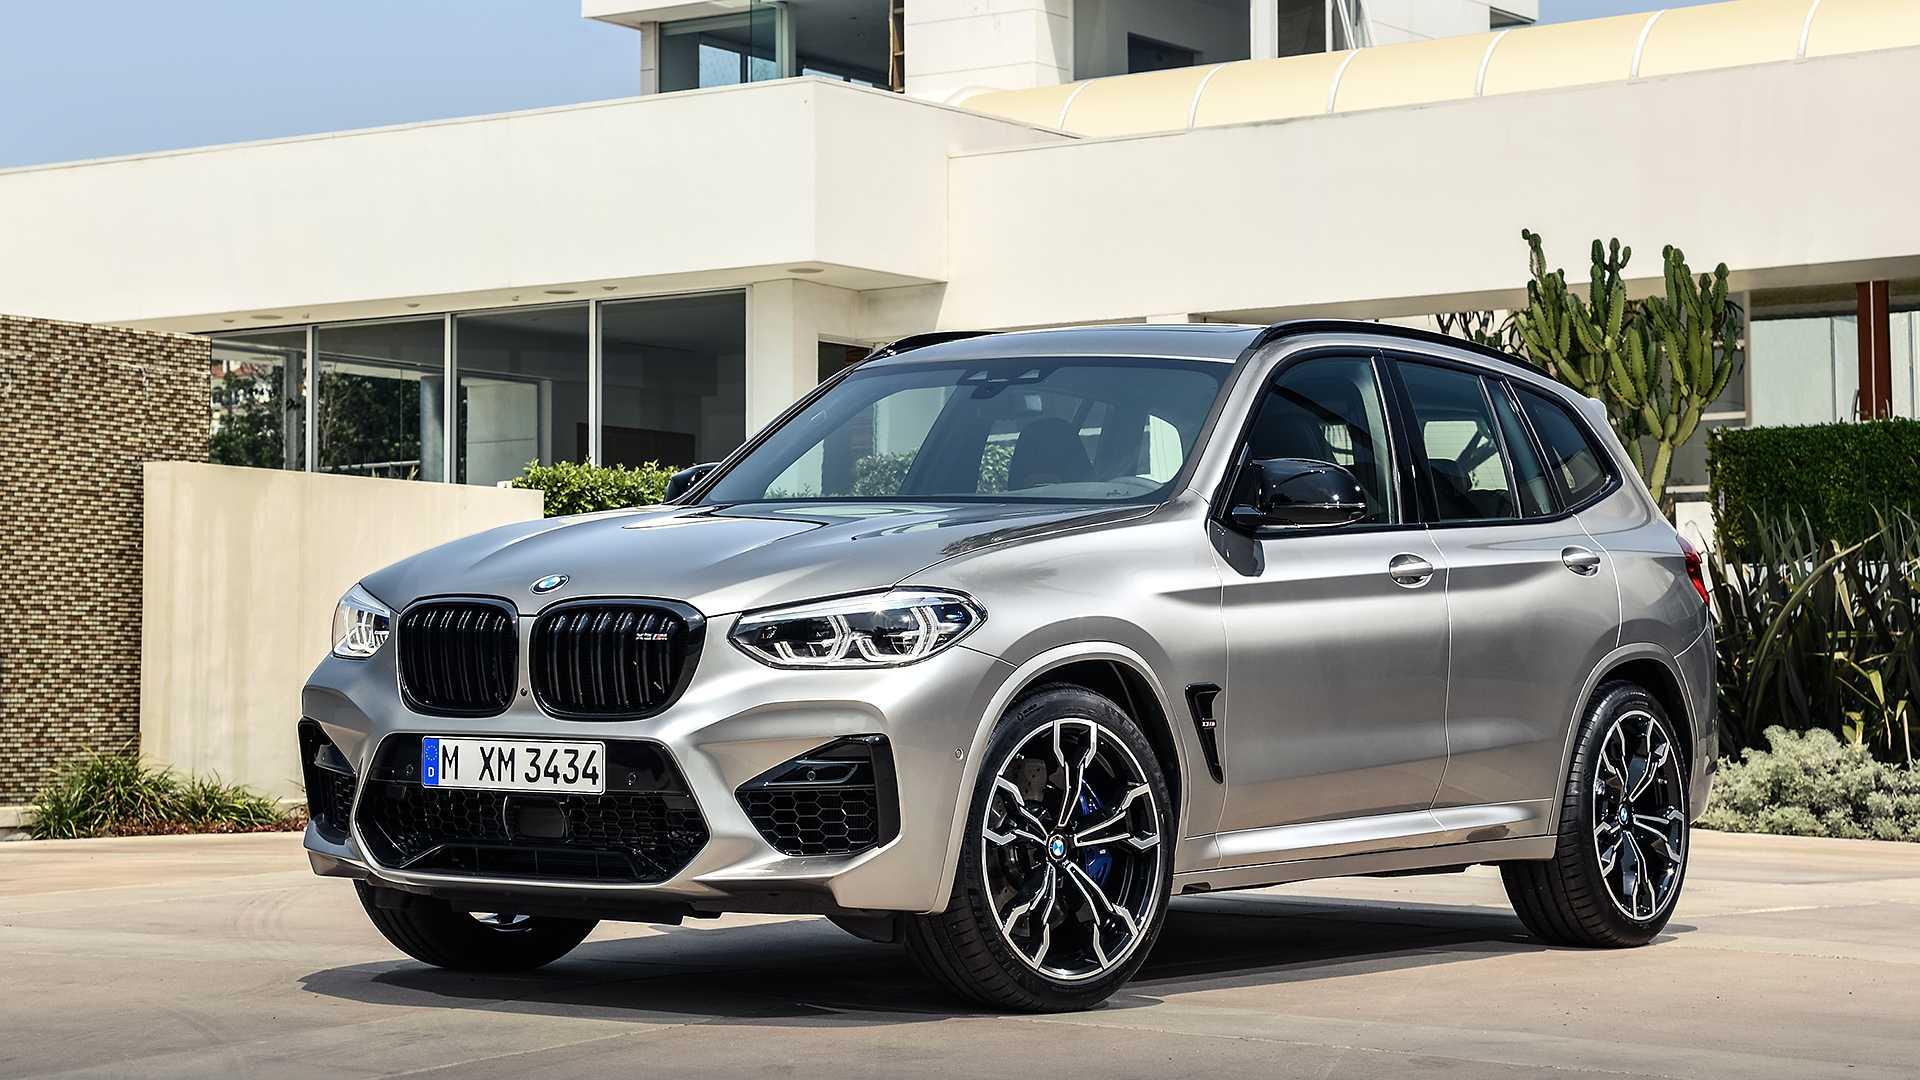 BMW X3 M 2019 года.